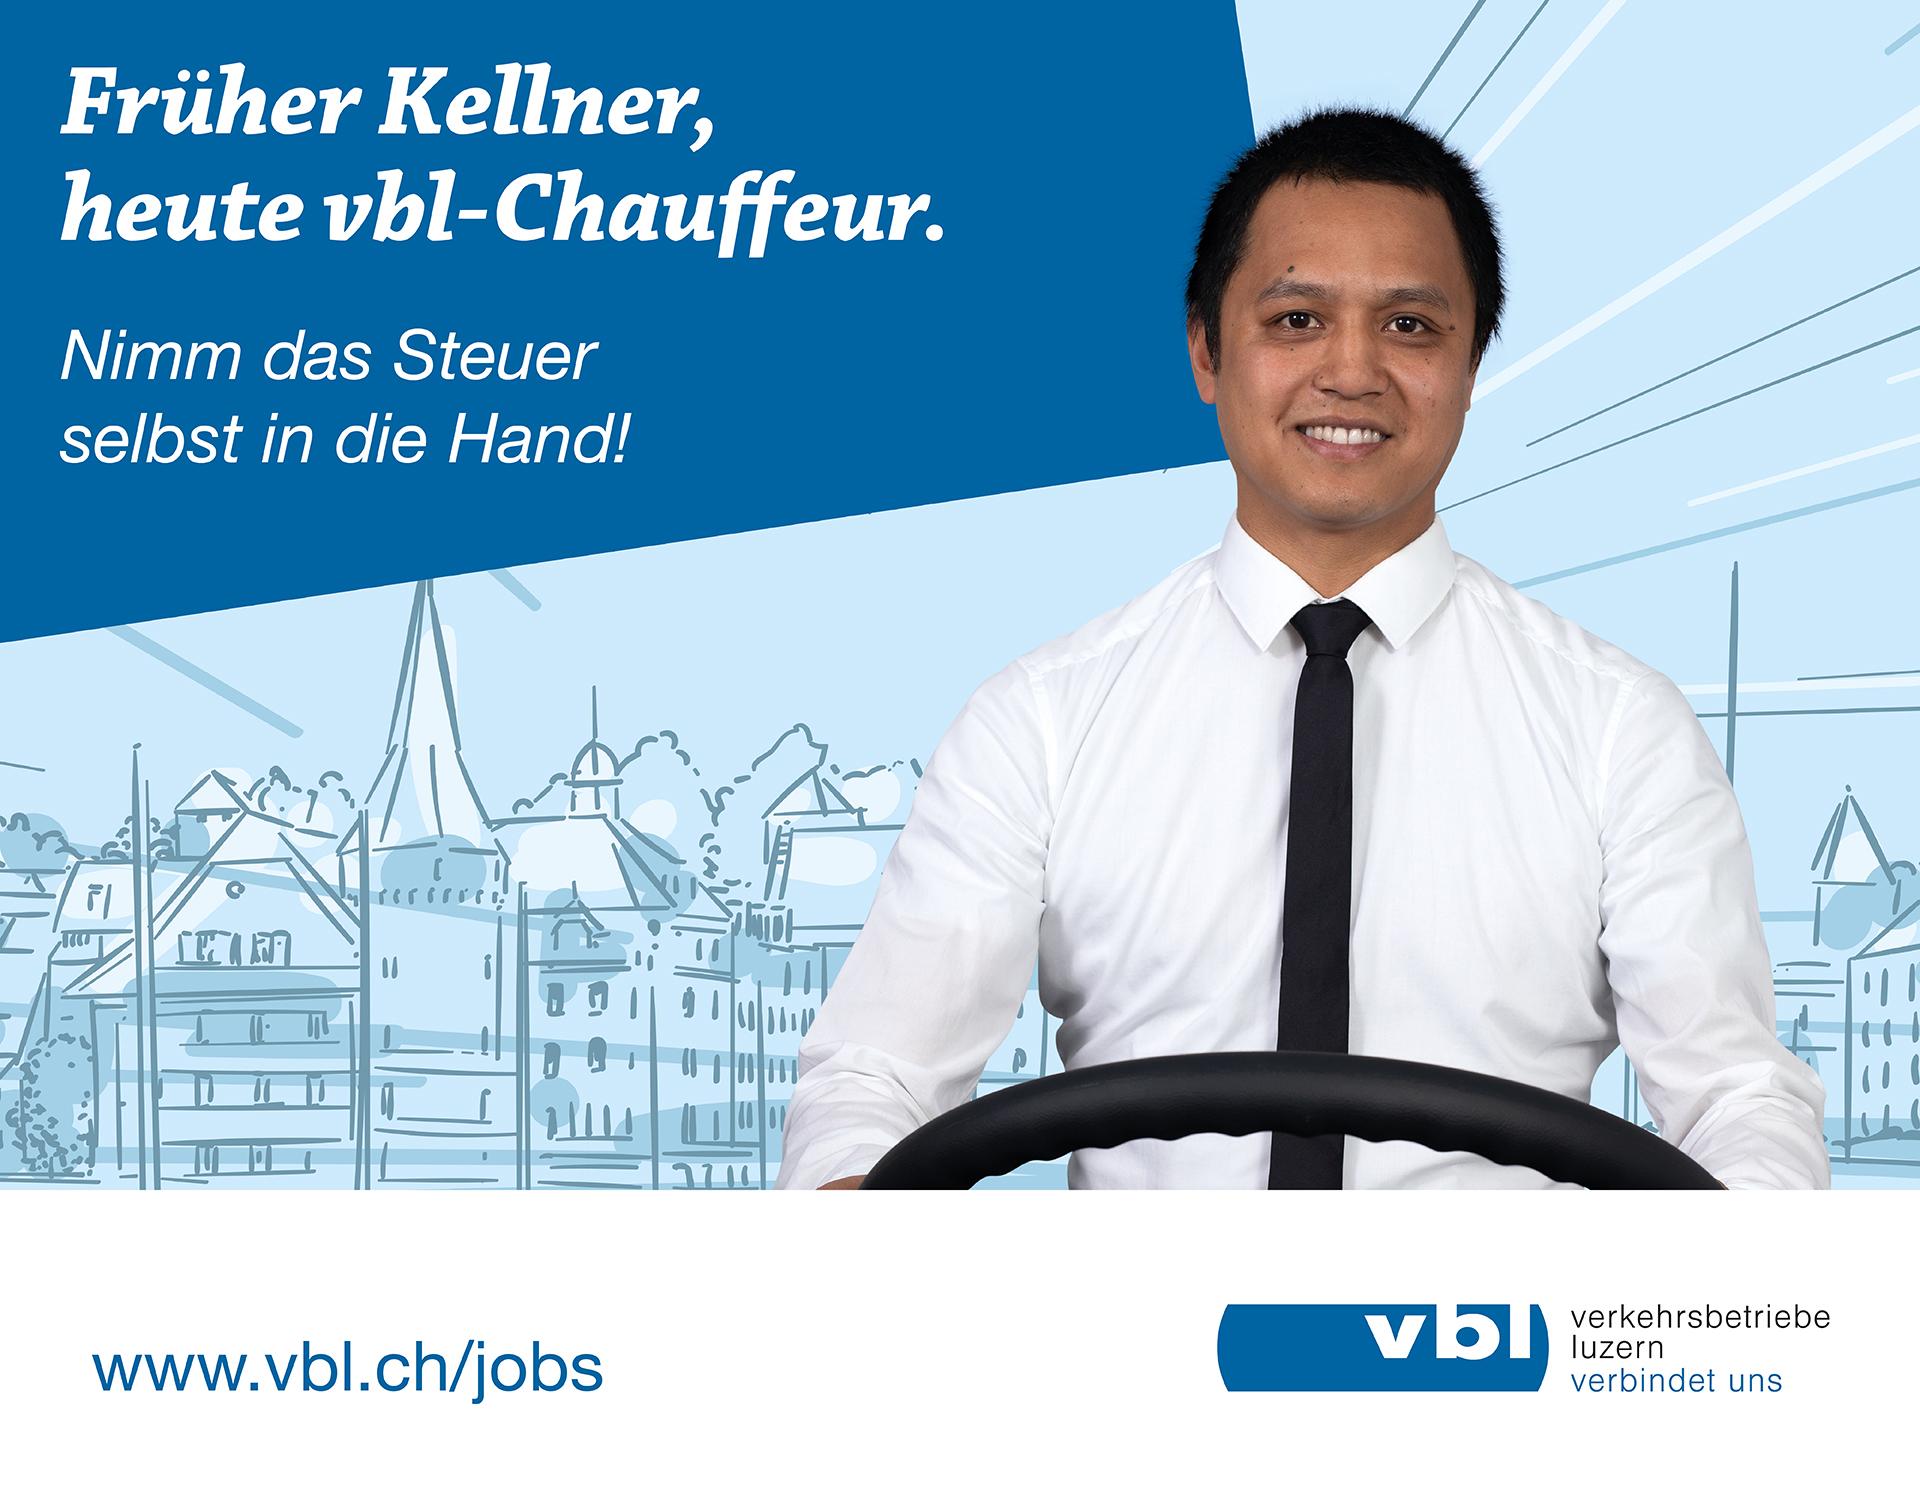 Früher Kellner, heute vbl-Chauffeur.